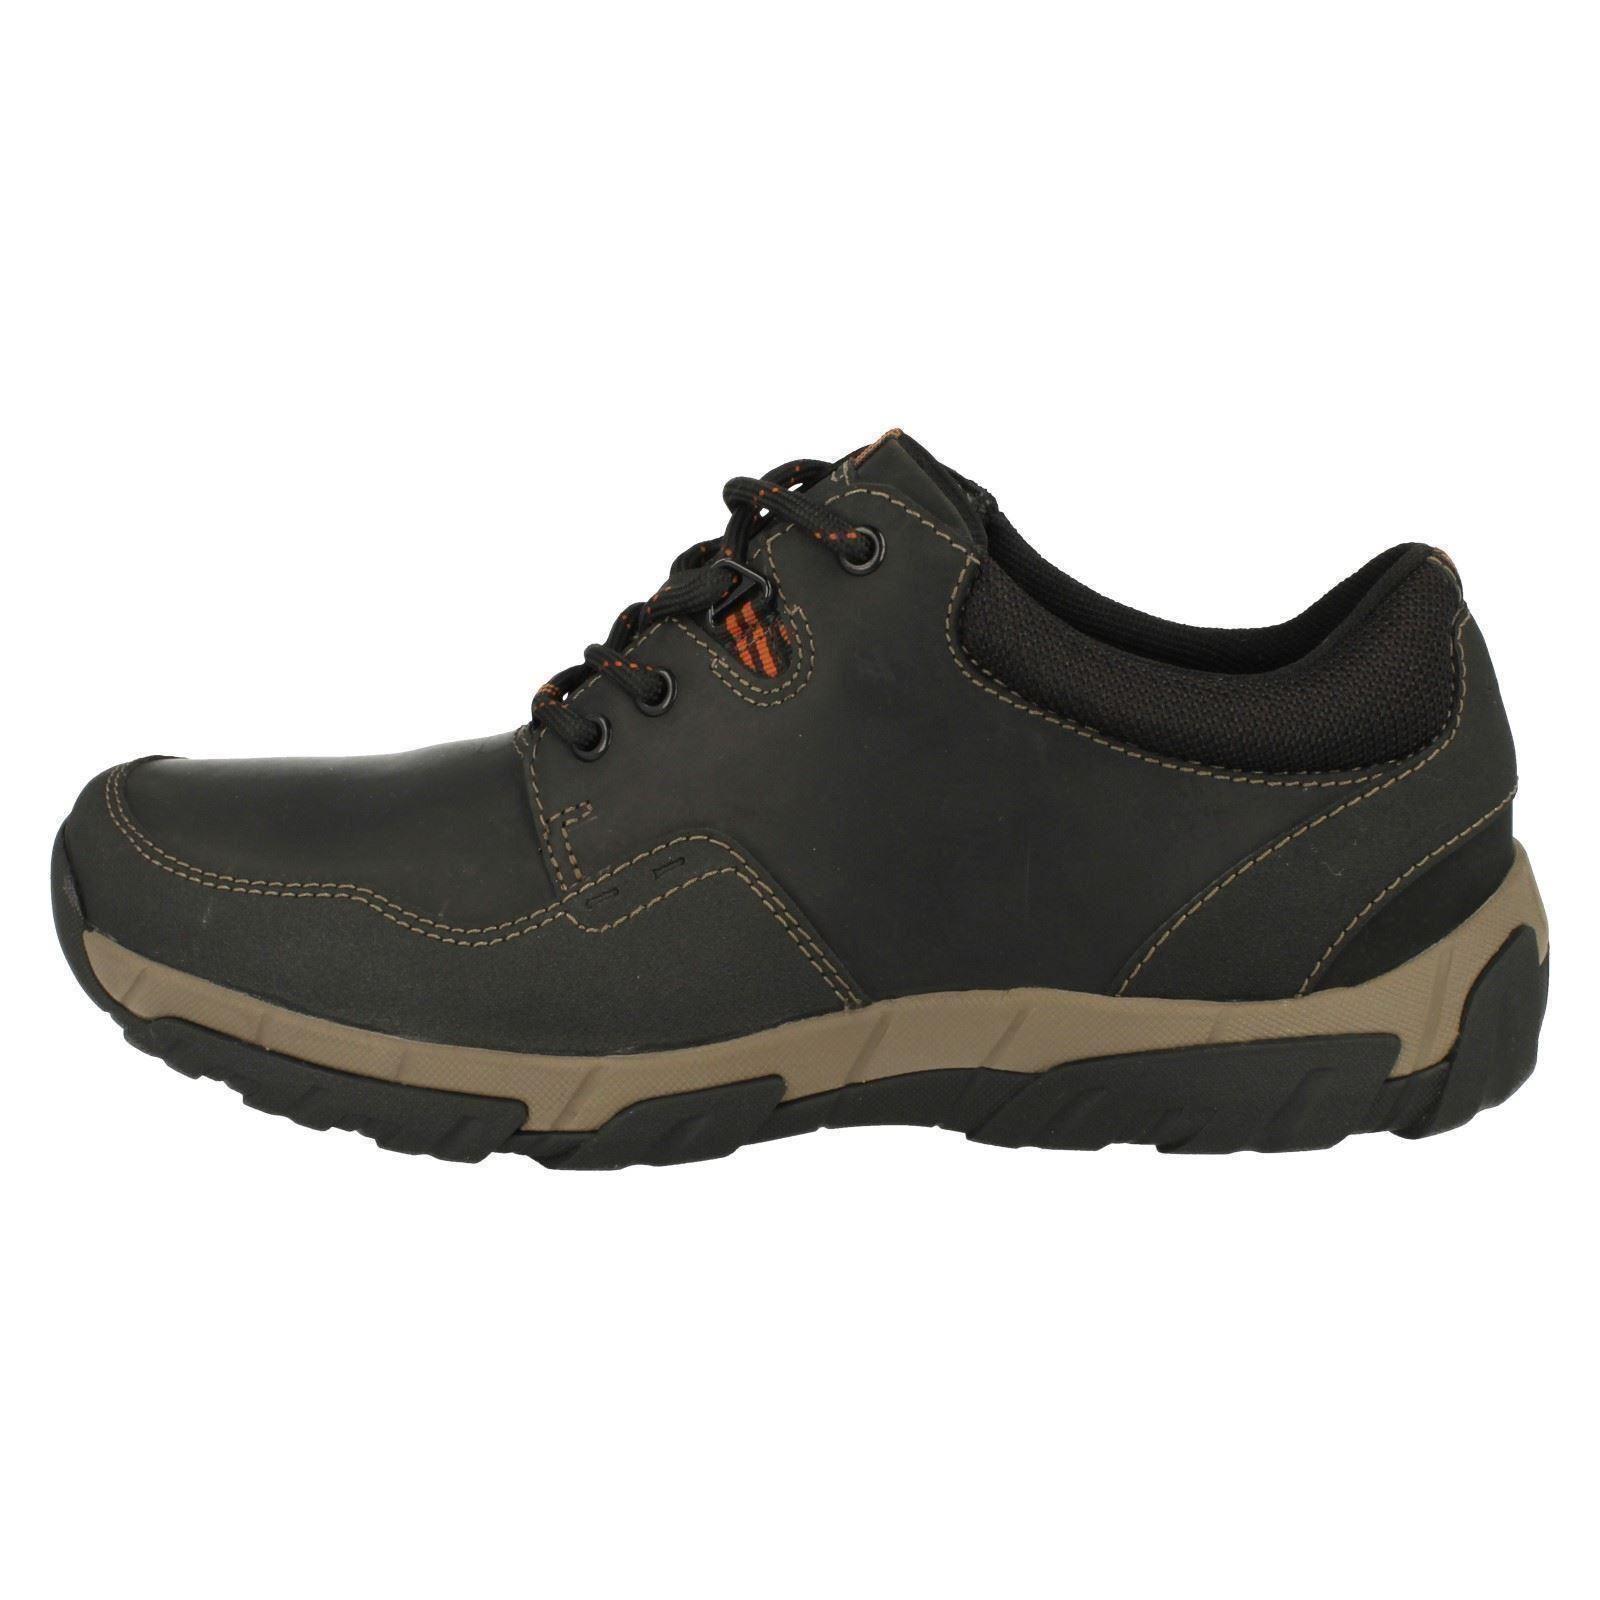 Con Zapatos Informal Walbeck Impermeable Cordones Edge Clarks Hombre fHzqTz